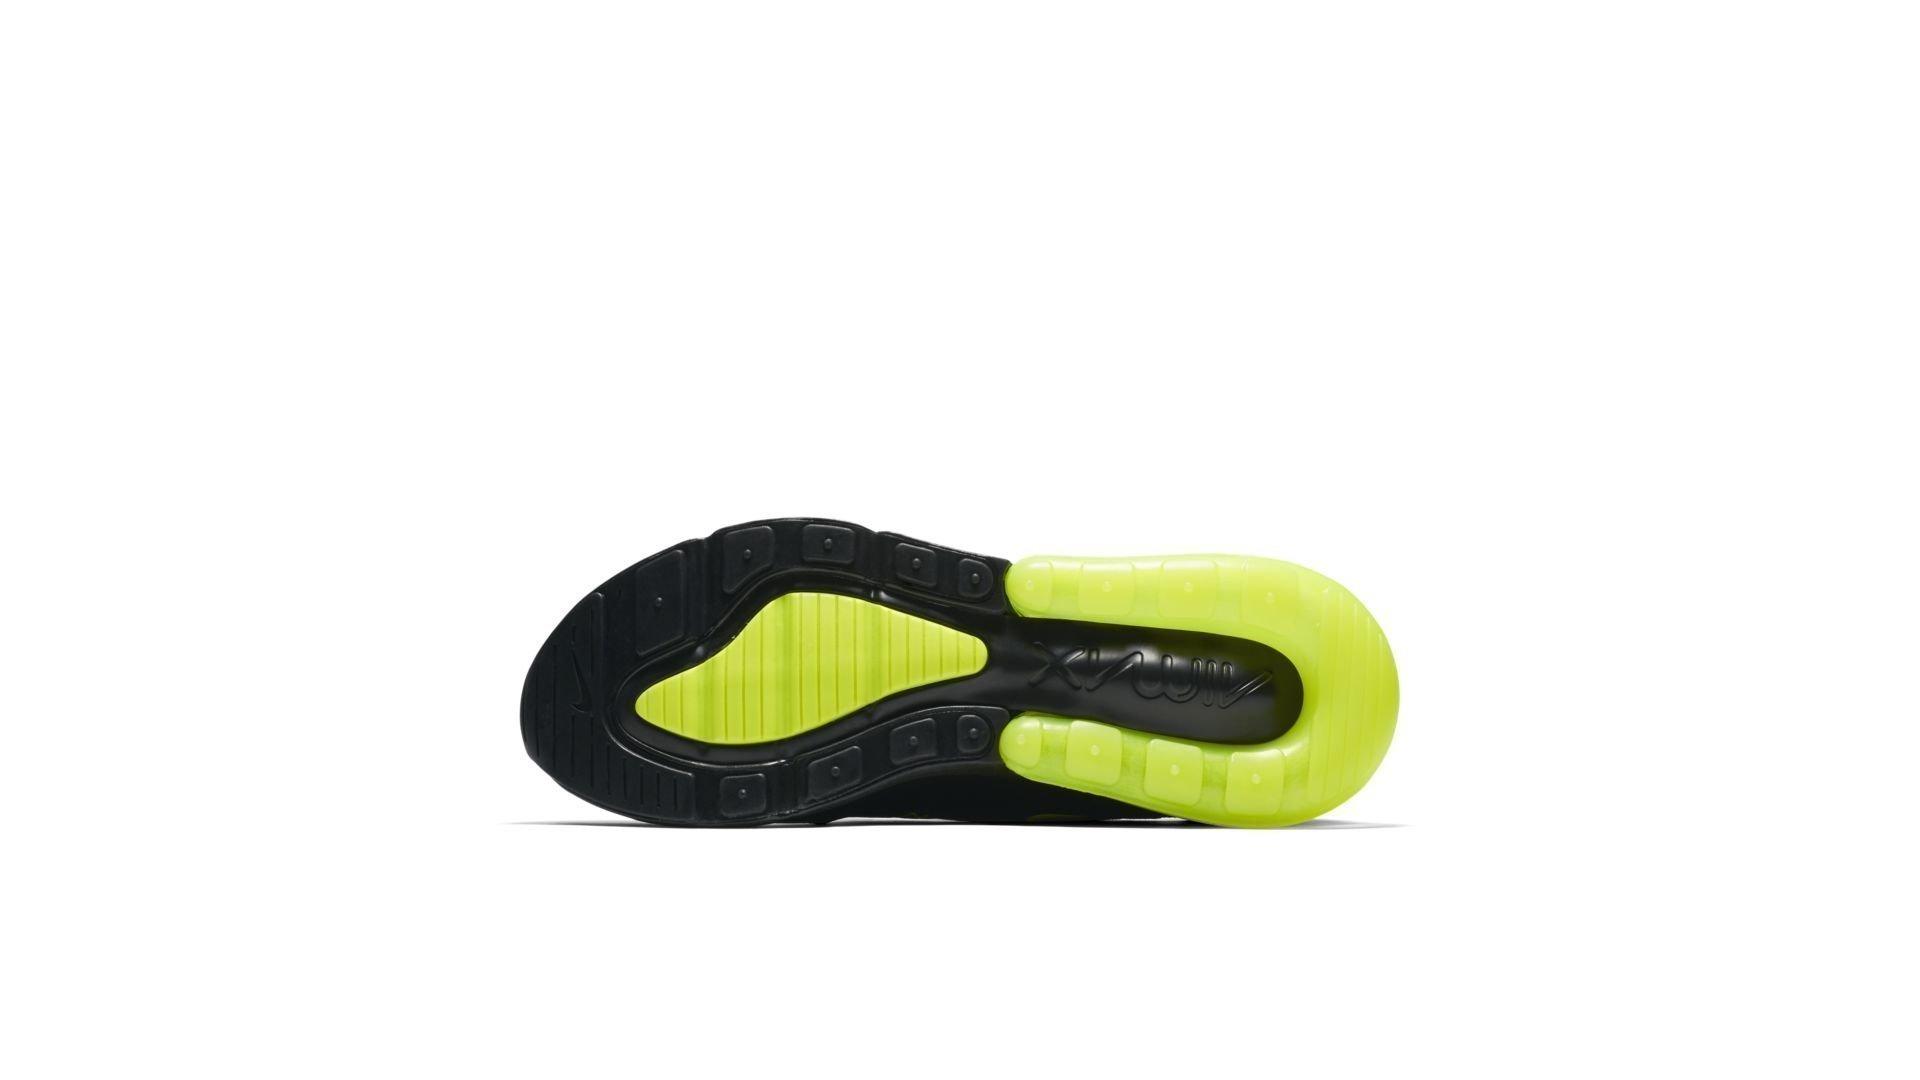 Nike Air Max 270 AH8050-017